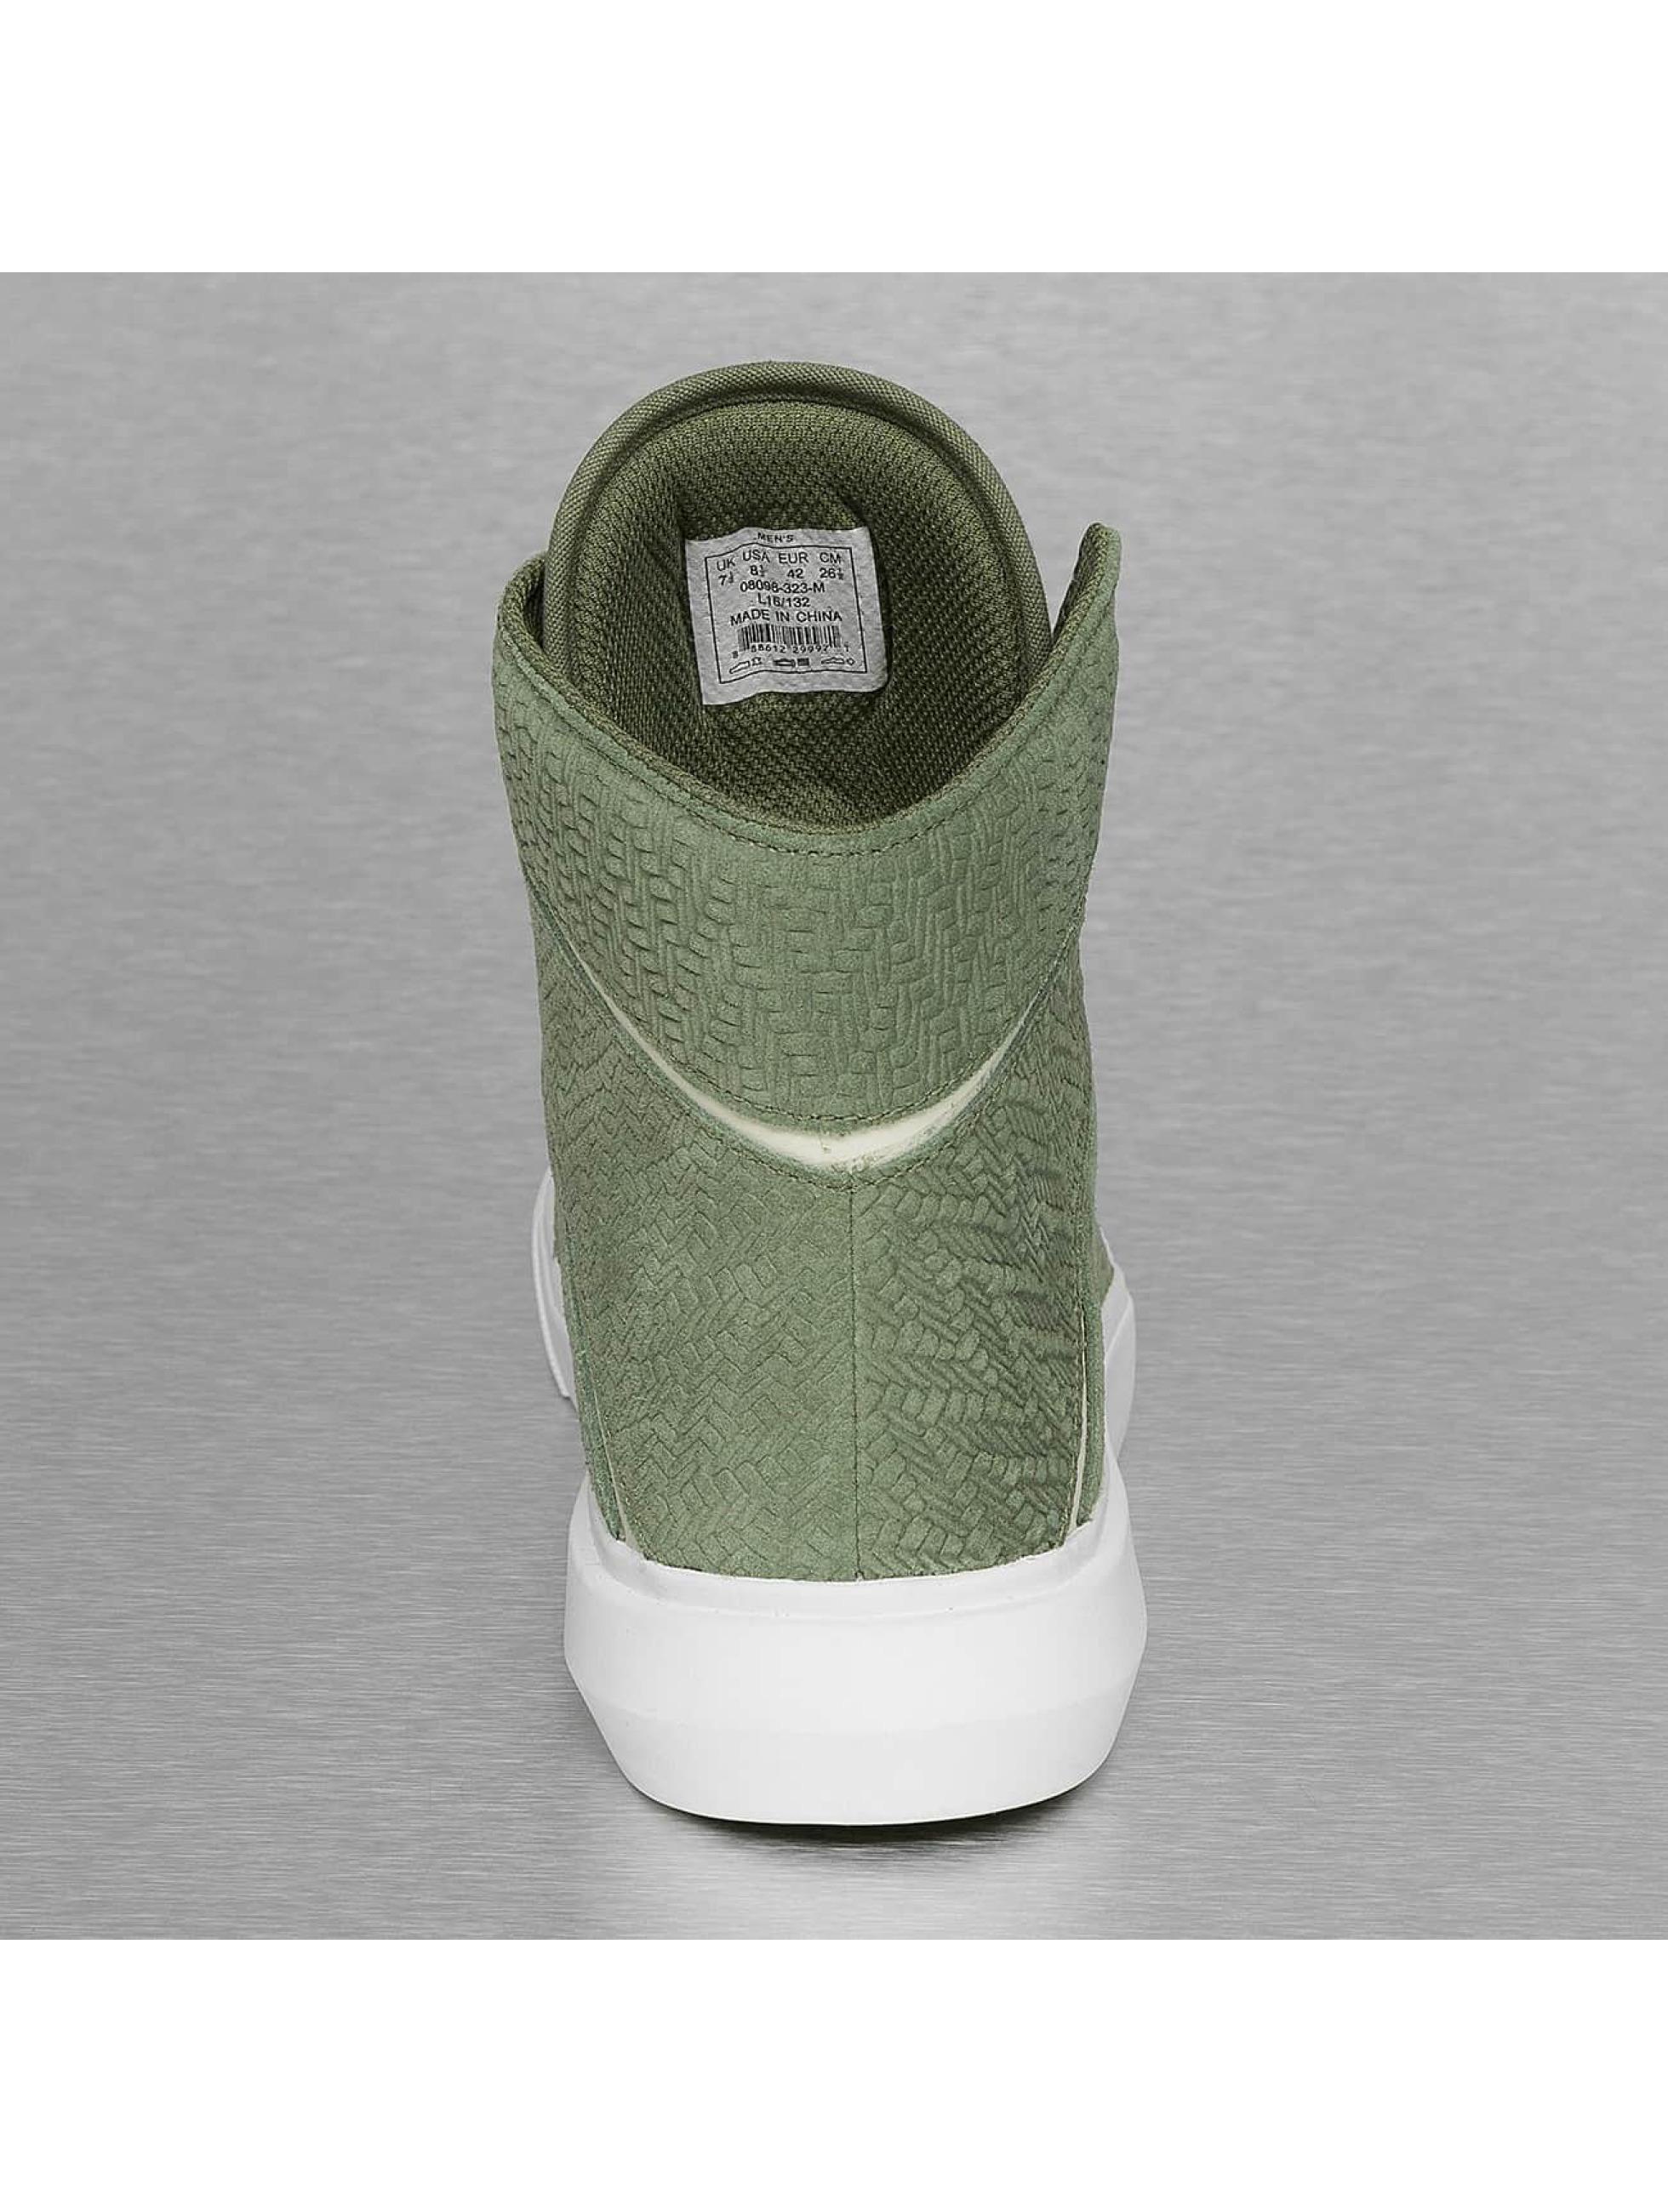 Supra Sneakers Camino olive